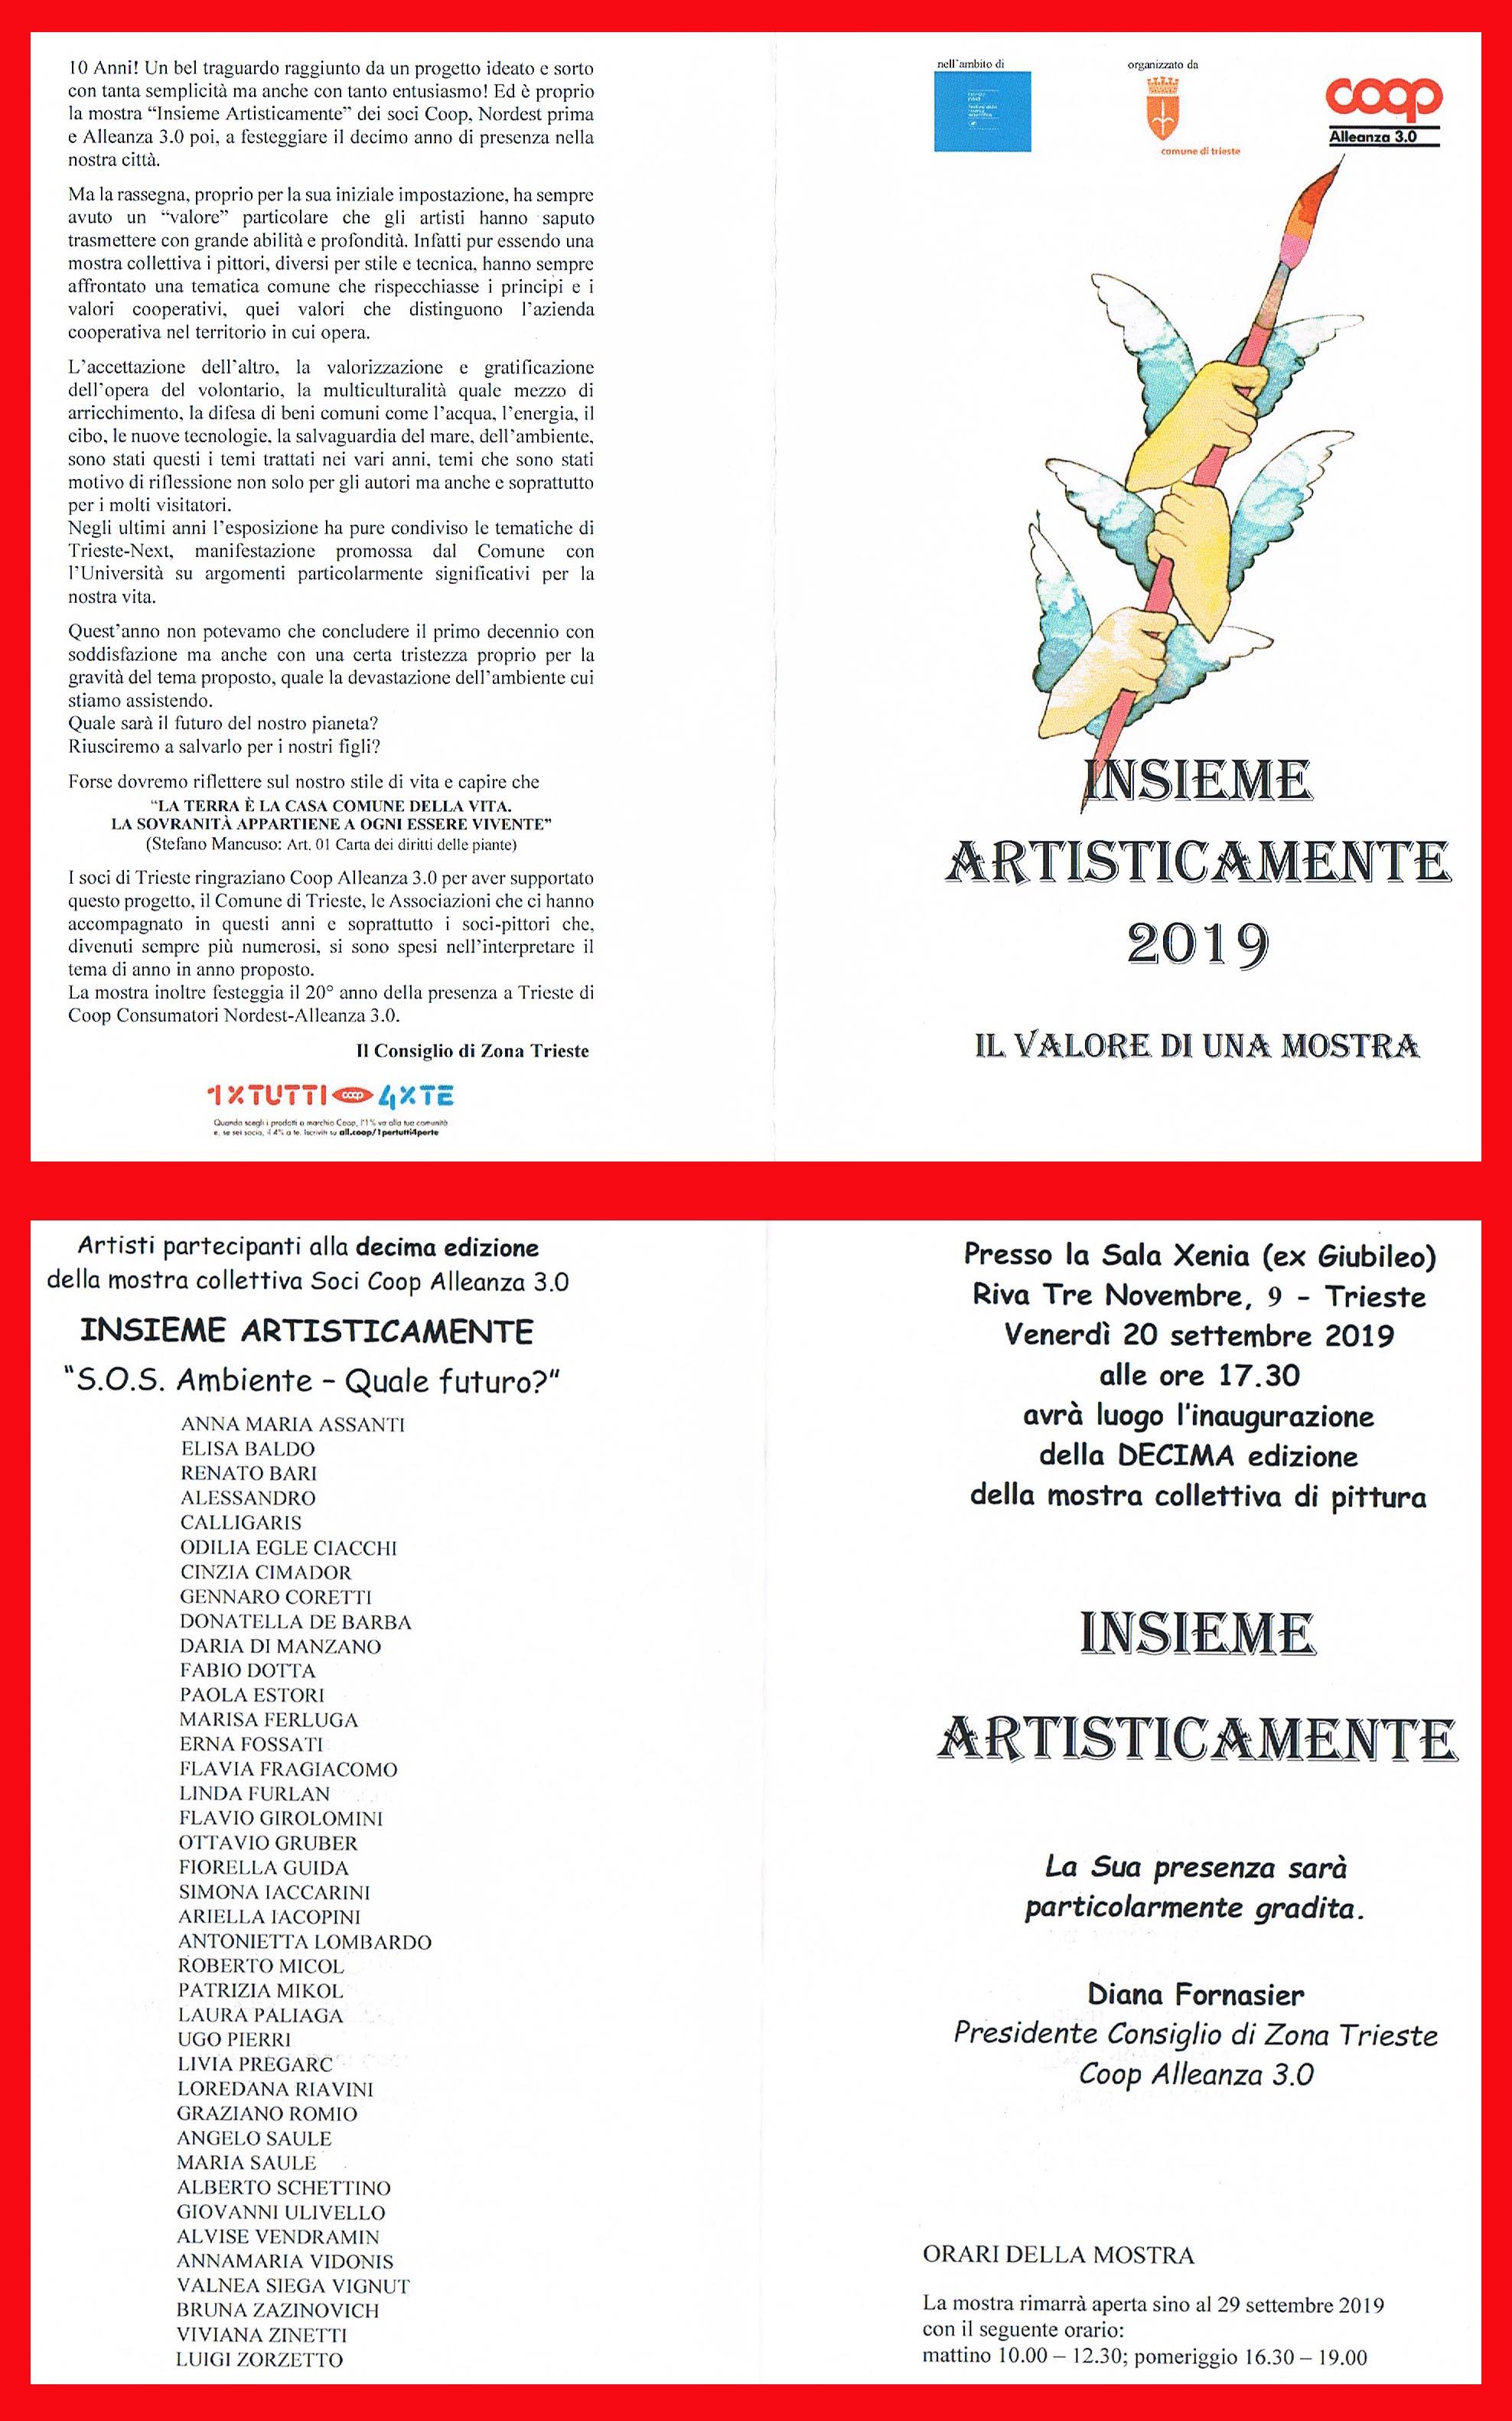 MOSTRA D'ARTE A TRIESTE SETTEMBRE 2019